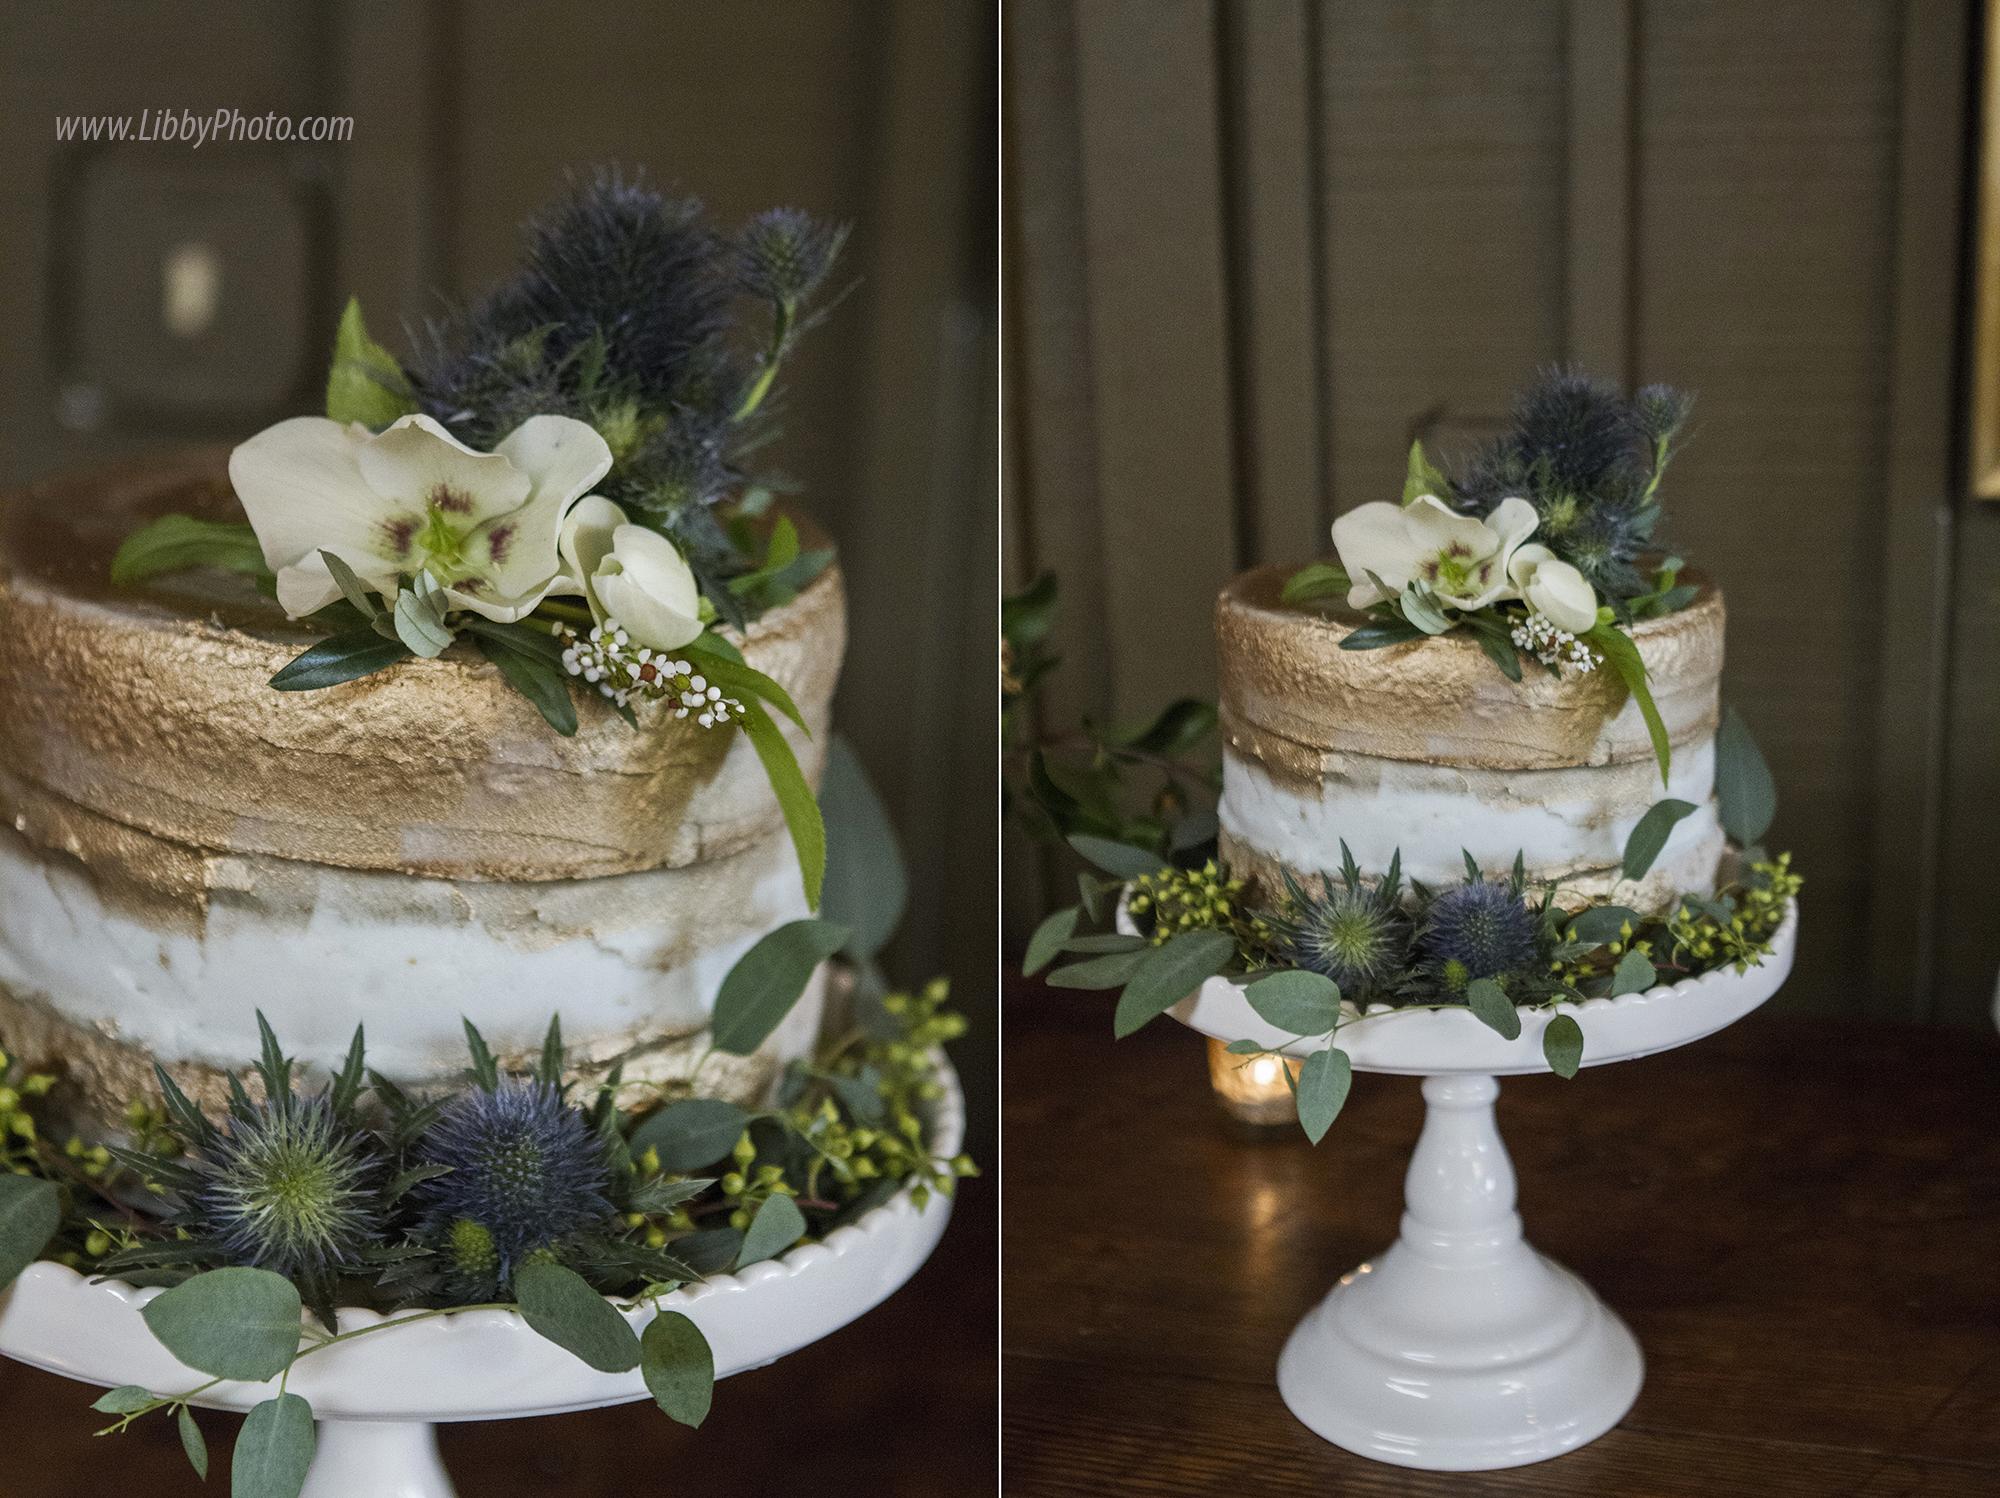 Atlanta wedding photography, Libbyphoto (34).jpg